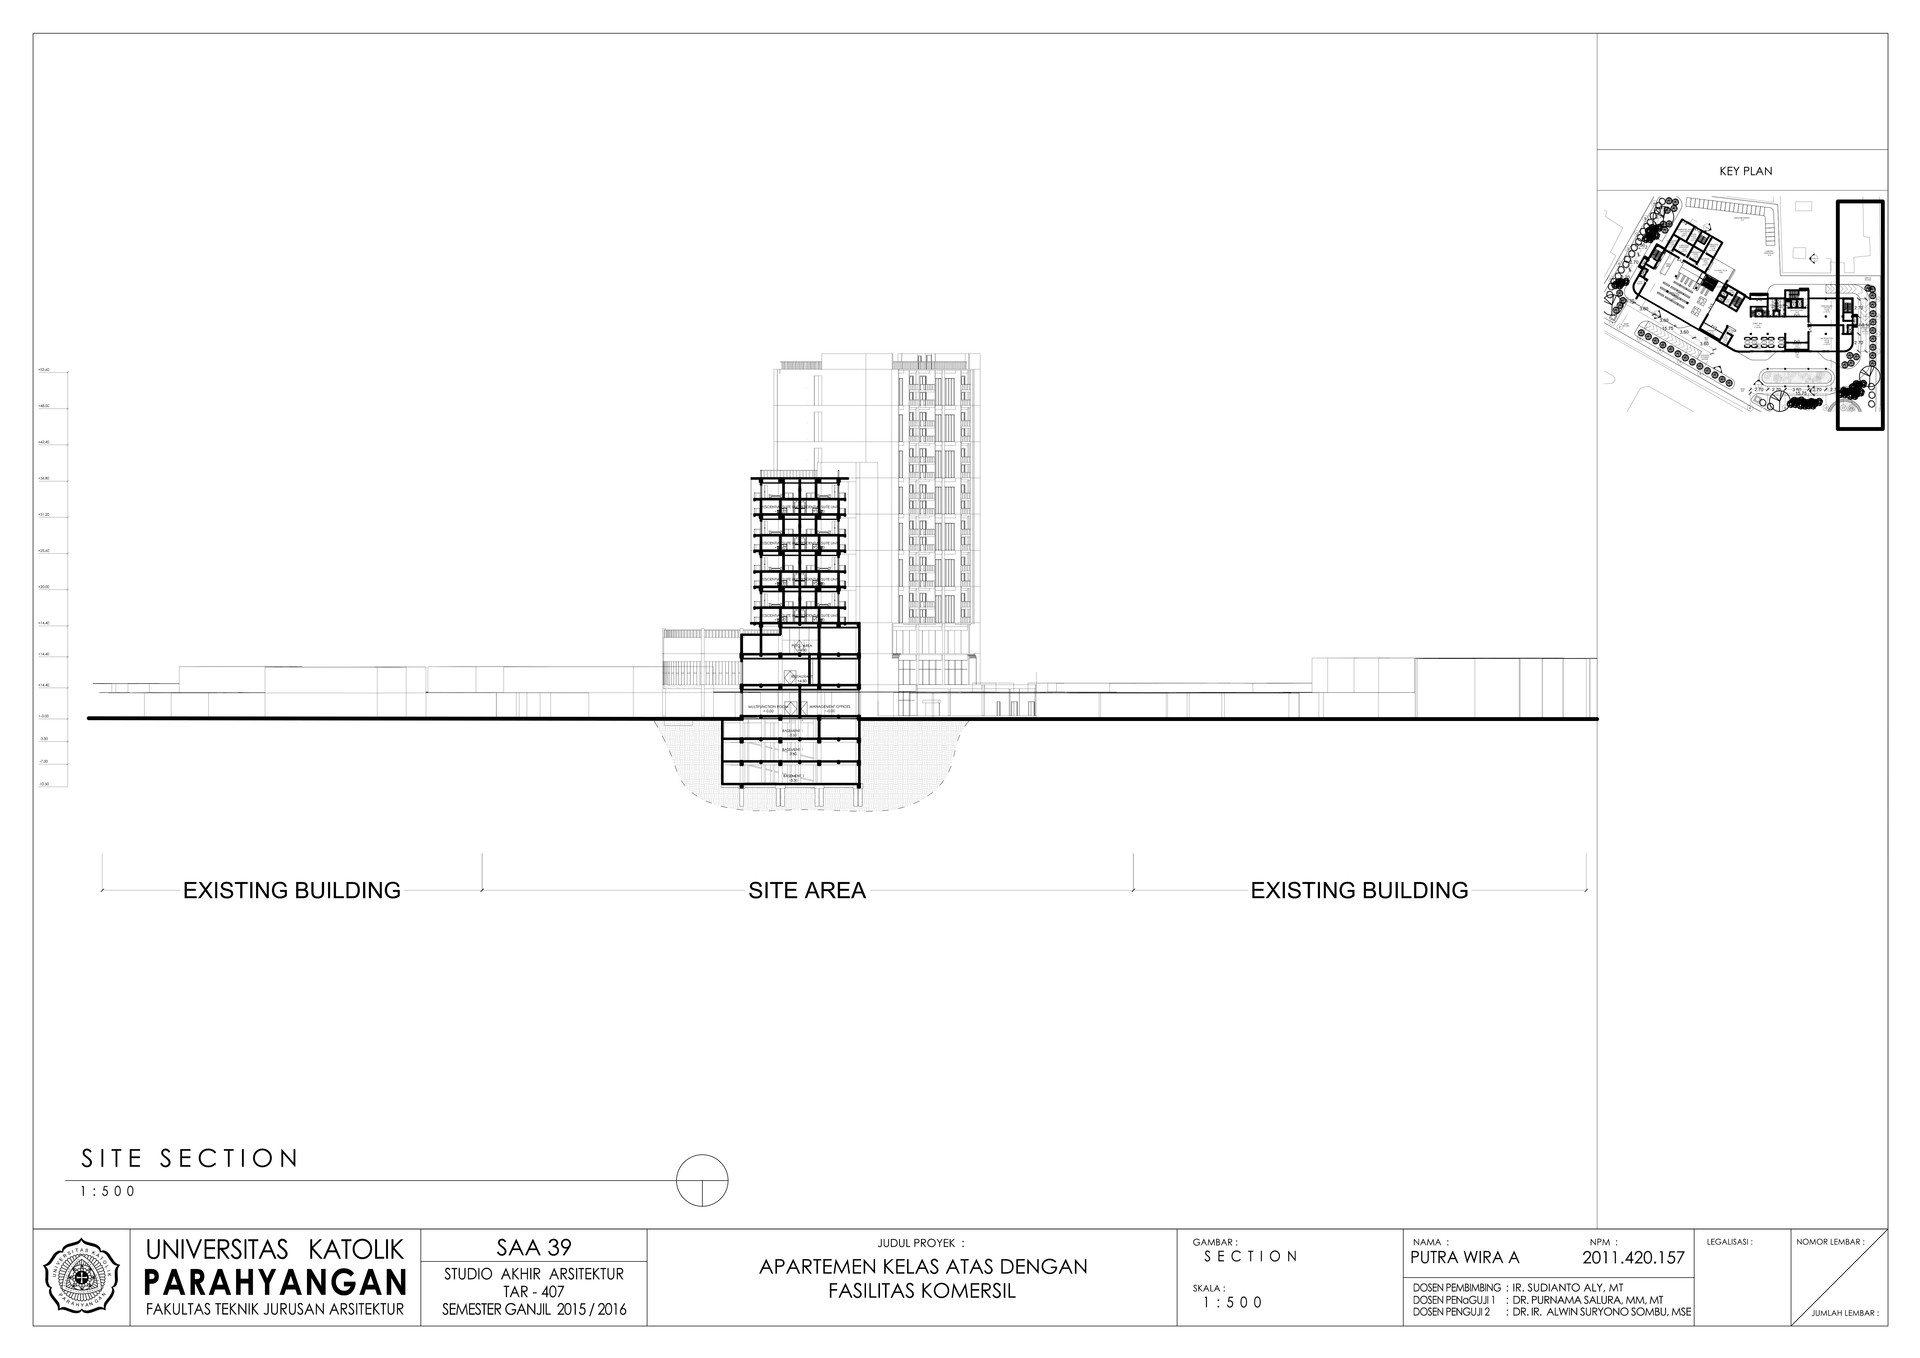 Putra wira adhiprajna 12 site section